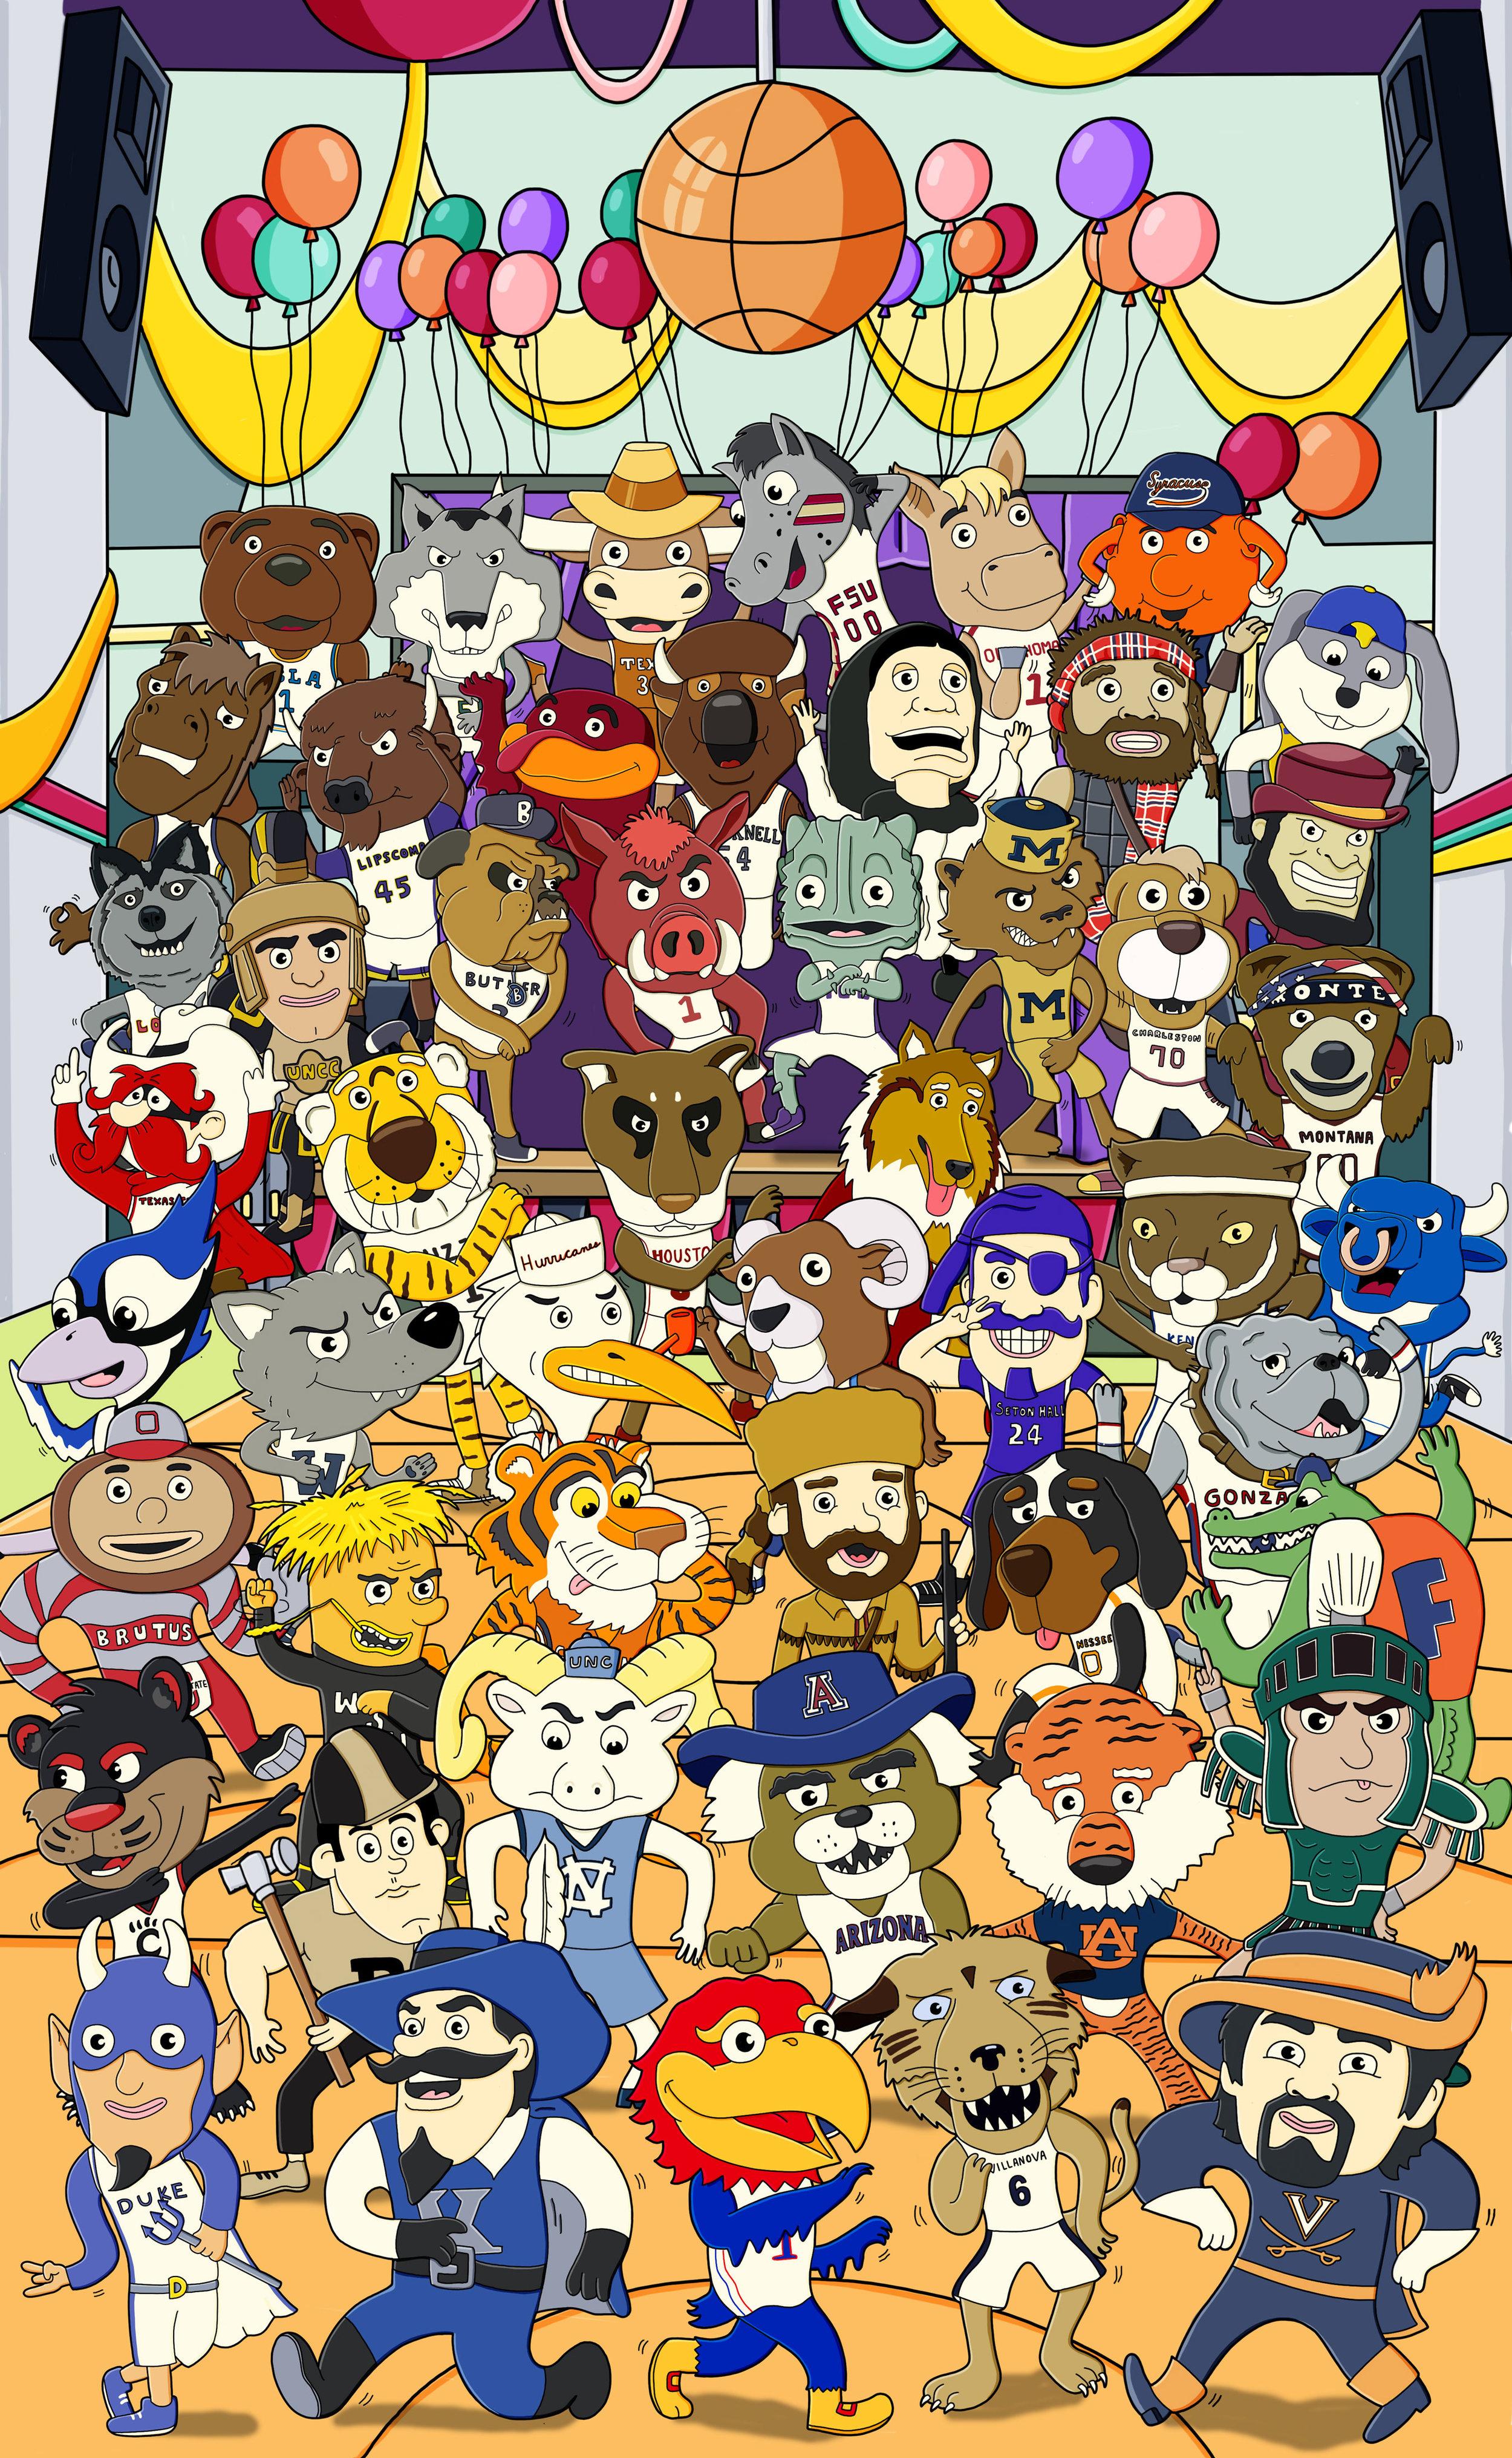 NCAA_Characters_with_Backdrop_2_web.jpg